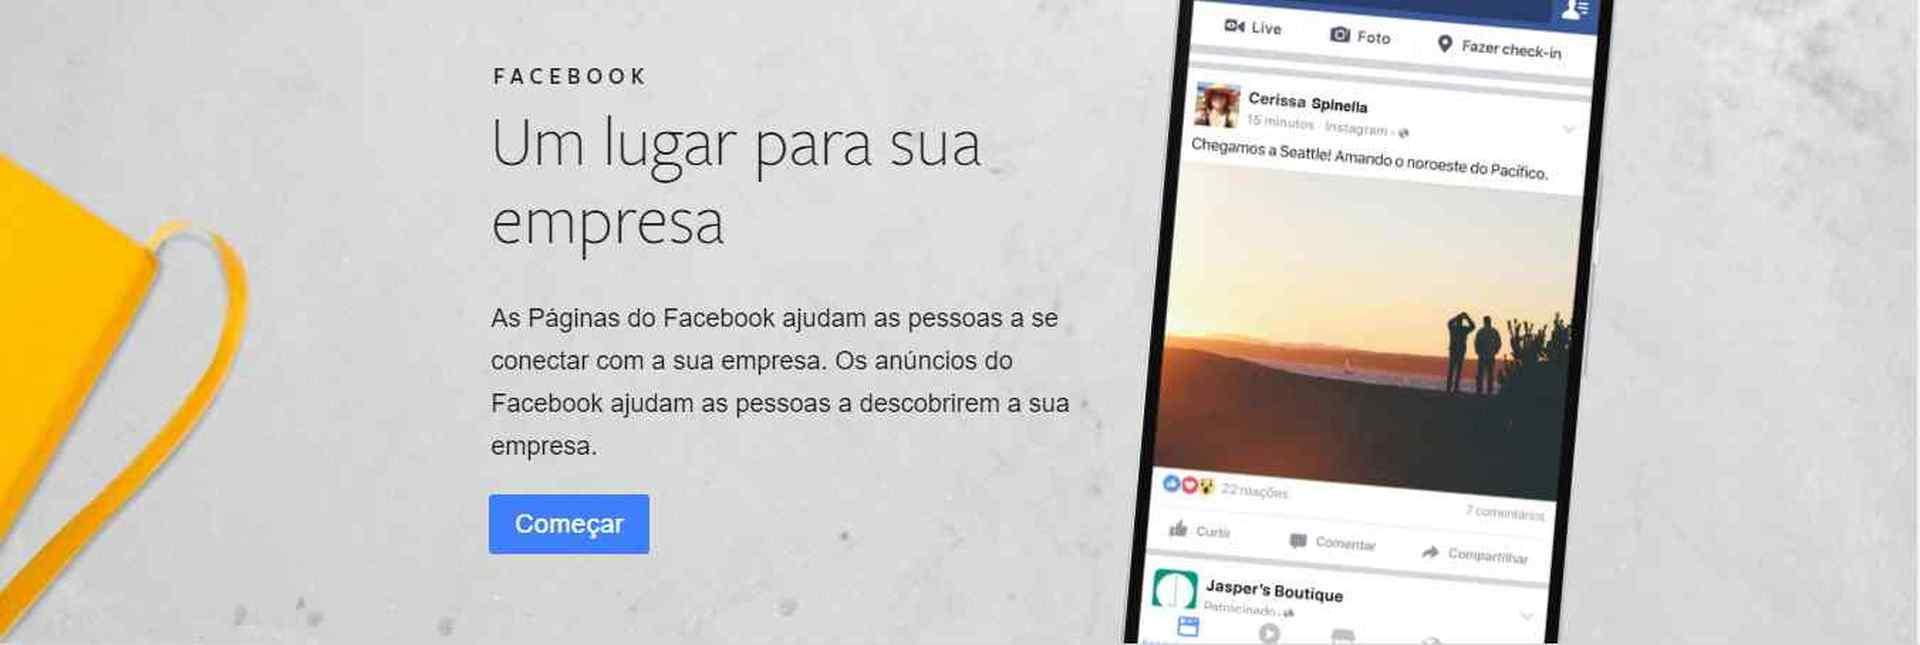 Facebook-em-Uberlândia-1